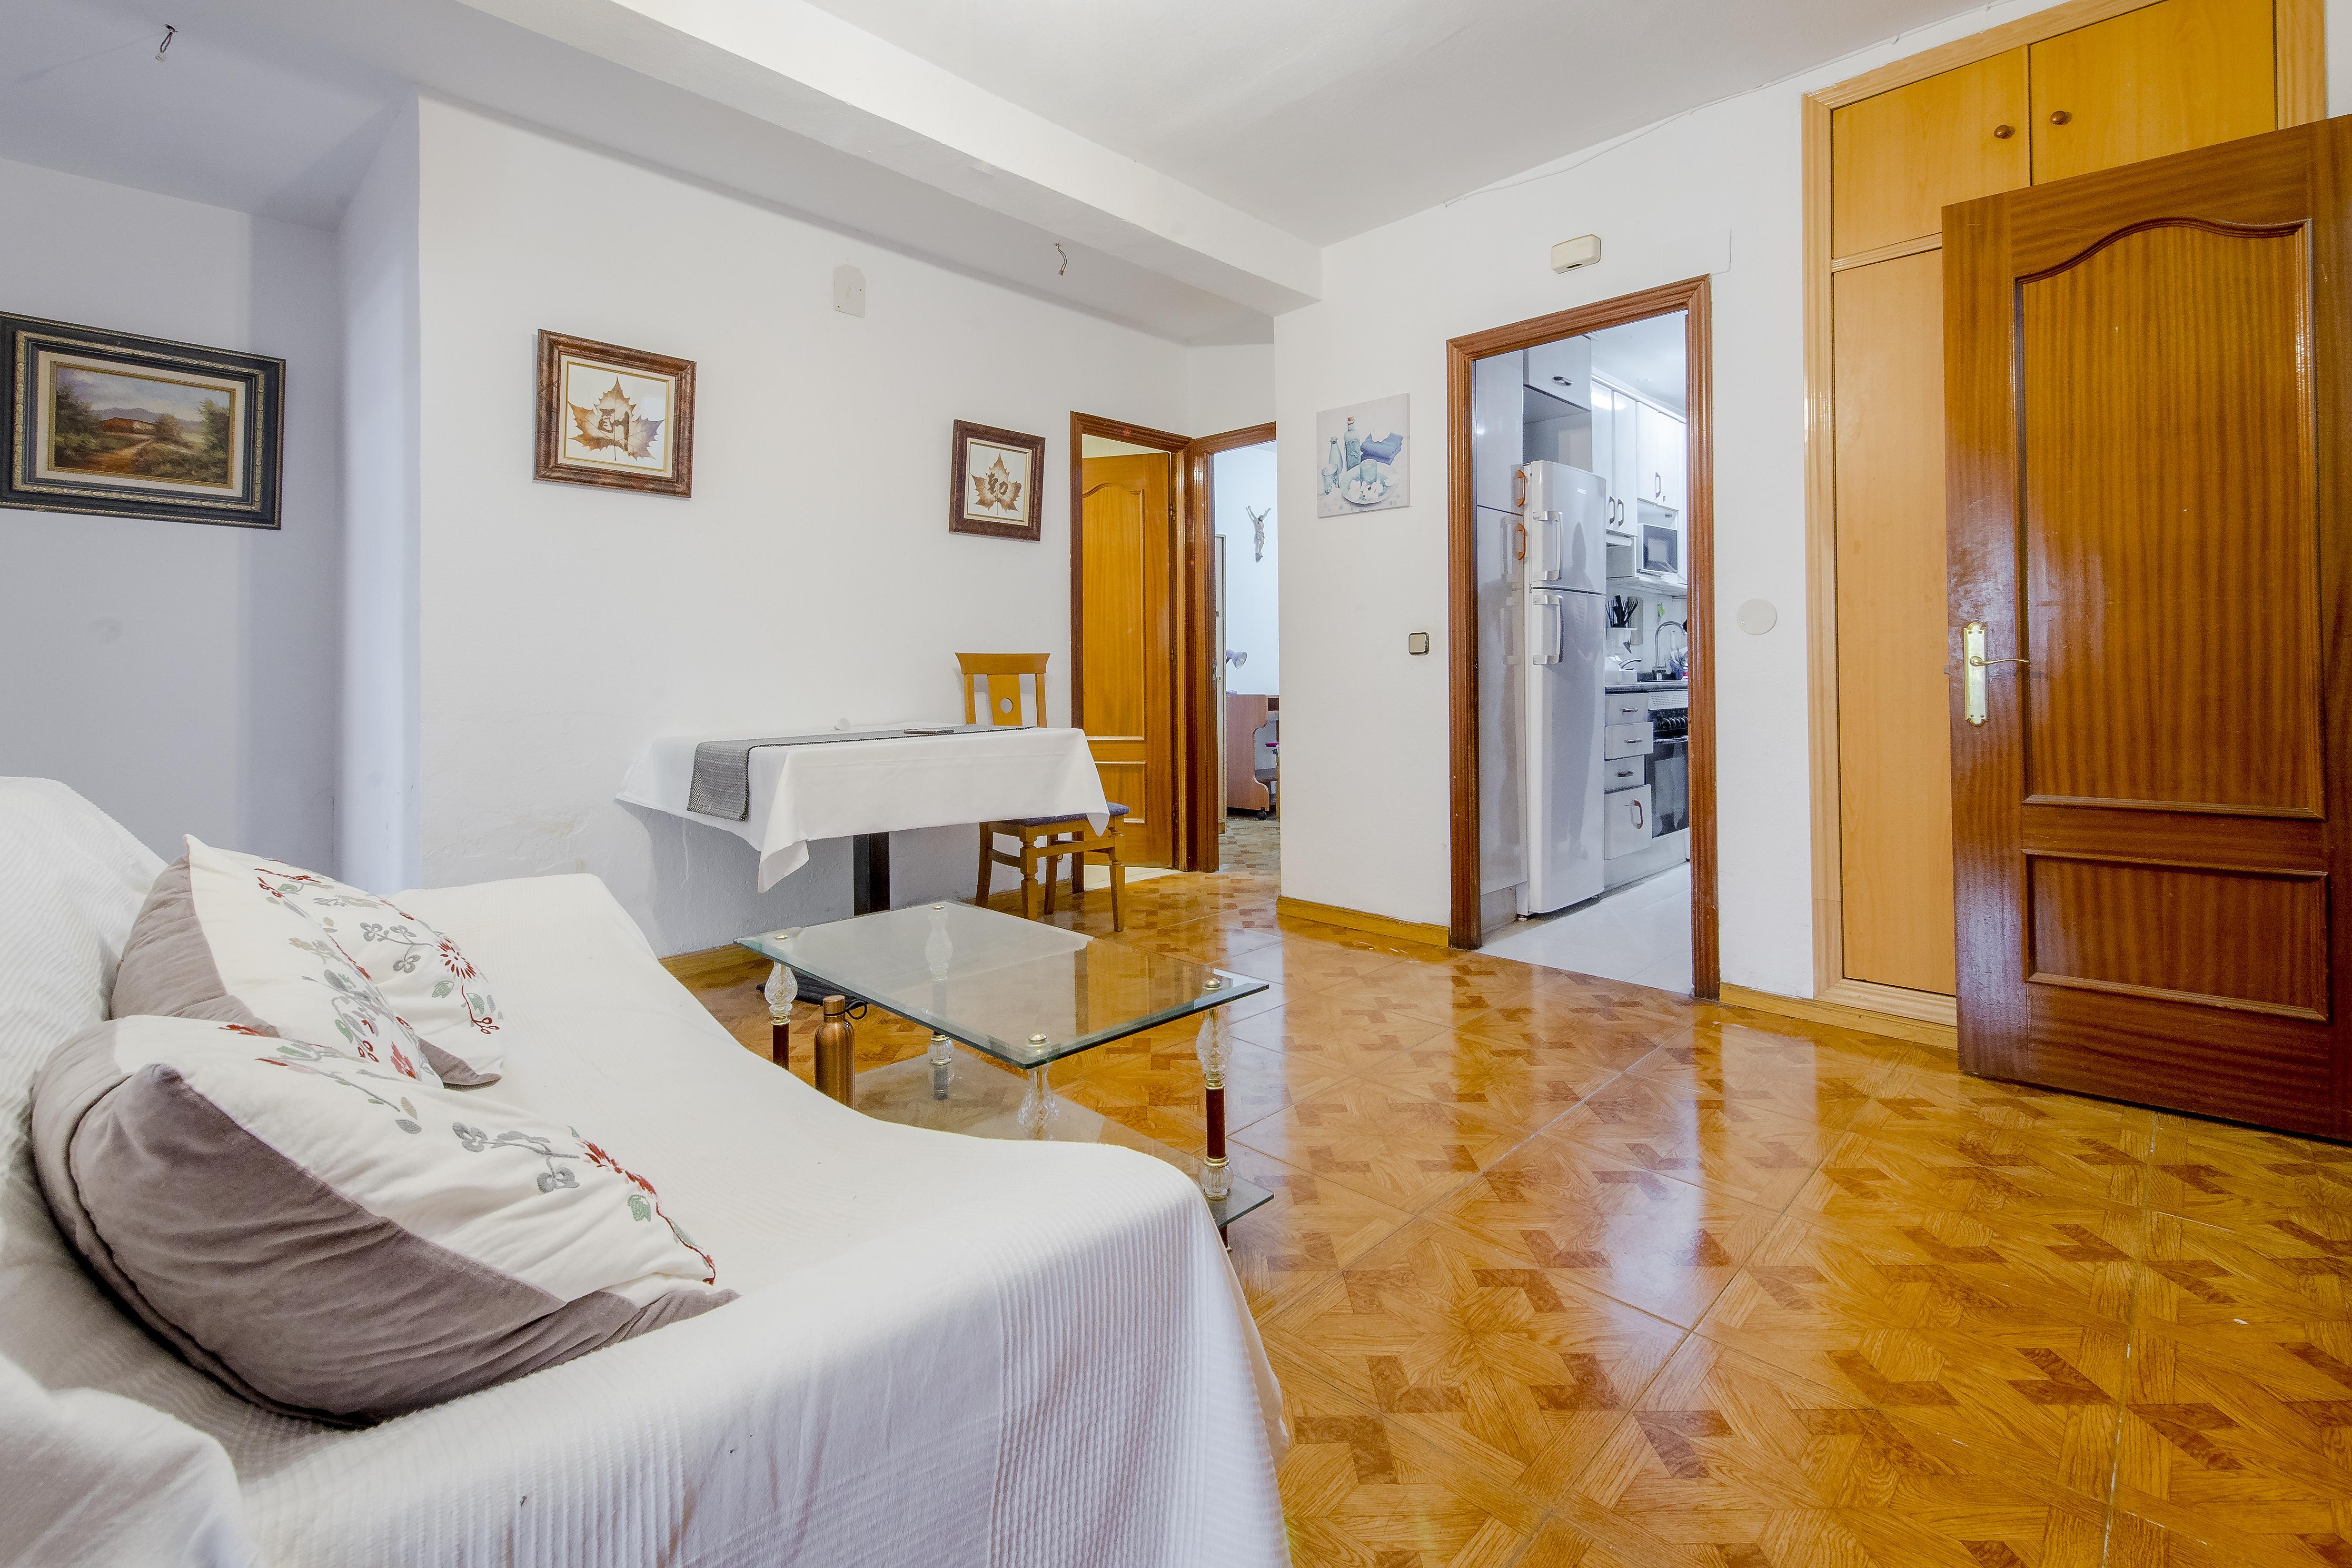 Piso en venta, Leñeros, Madrid capital